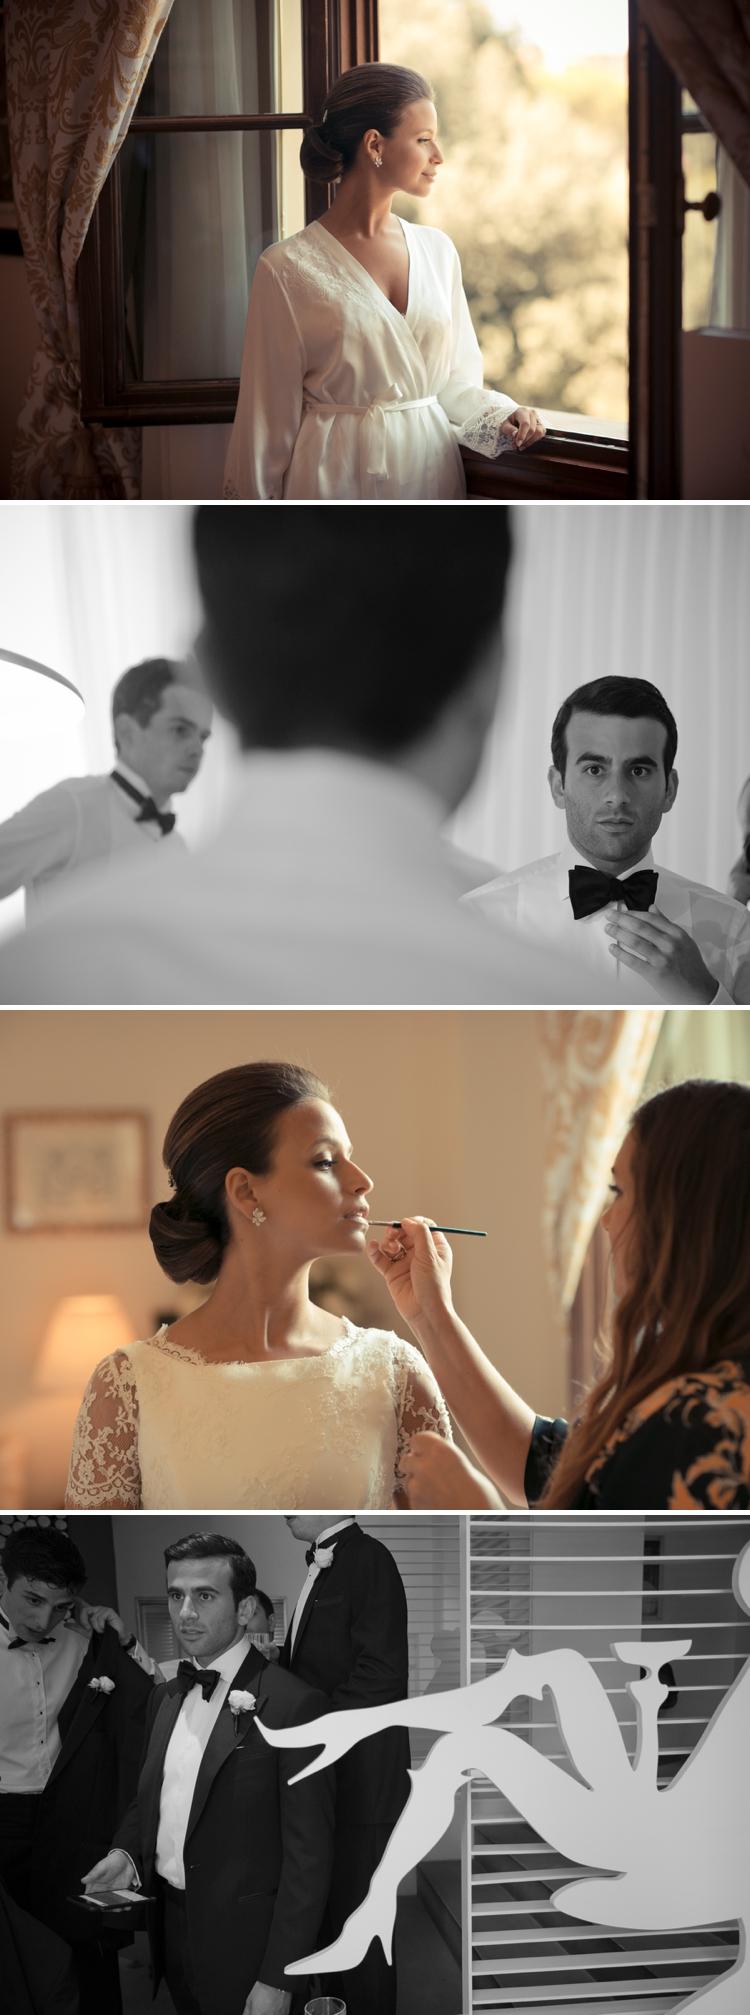 Jewish-wedding-Florence_0379 :: SMASHING THE GLASS :: Luxury wedding photography - 1 :: Jewish-wedding-Florence_0379